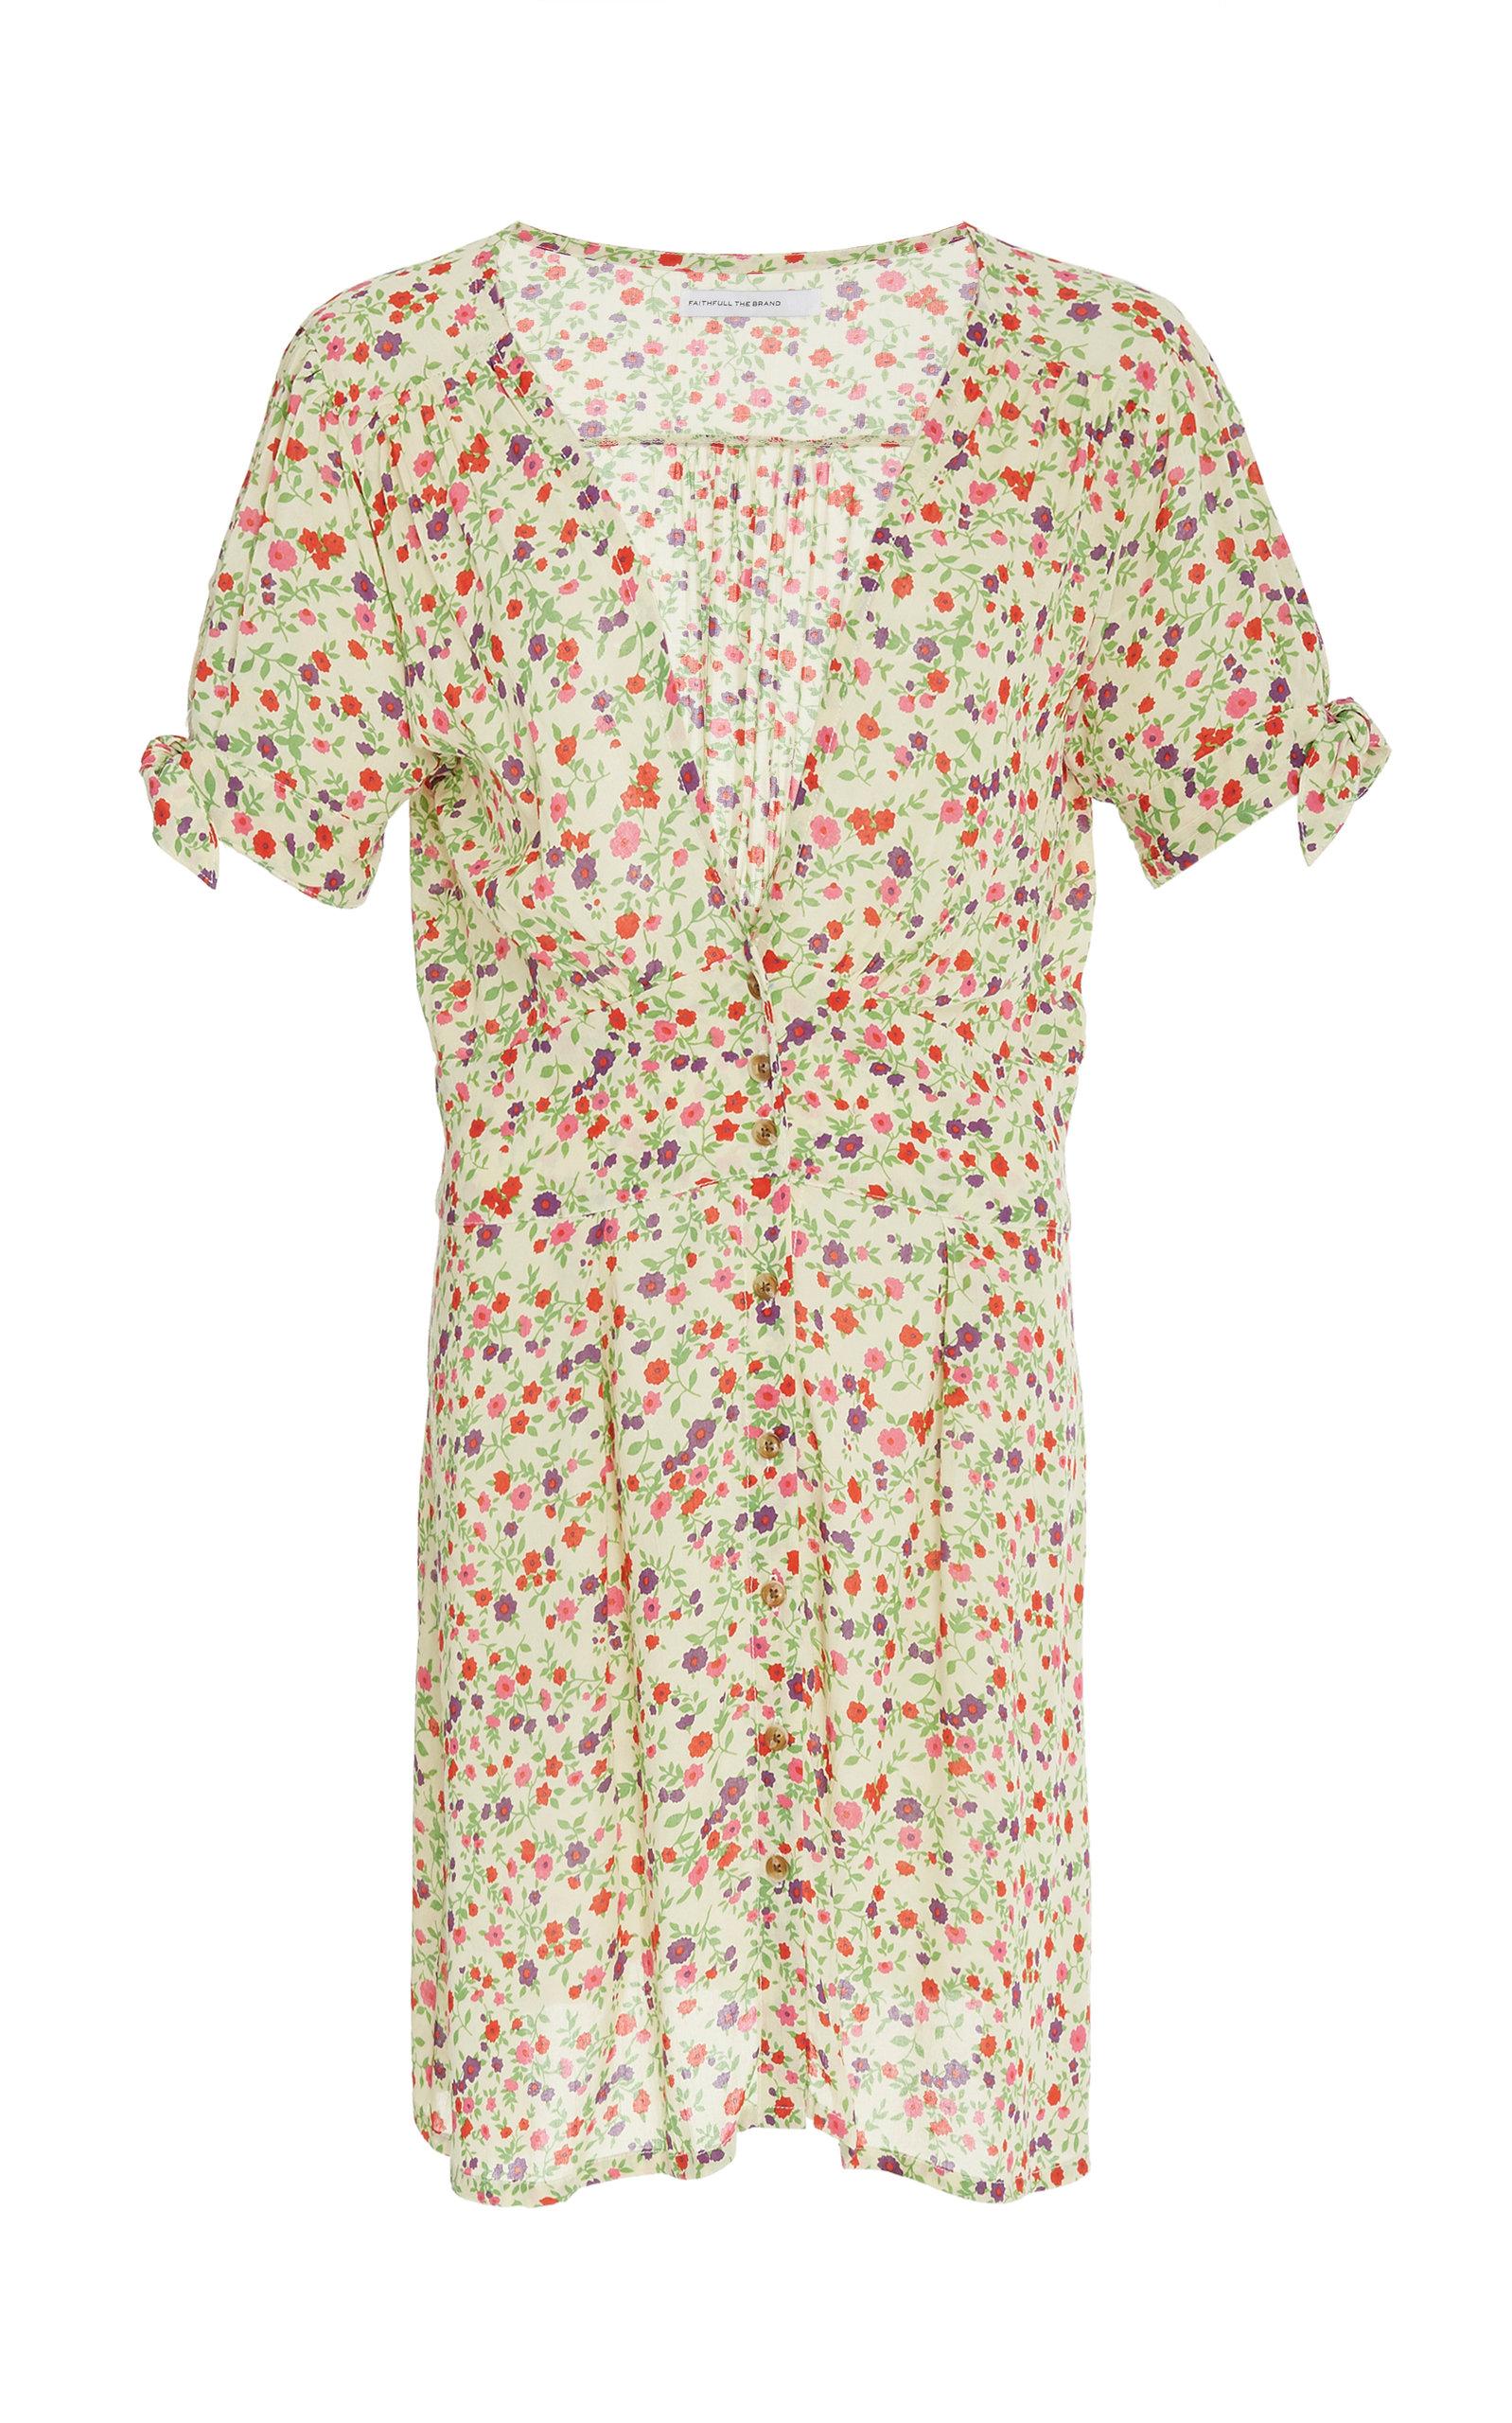 Faithfull MARIANNE MINI DRESS